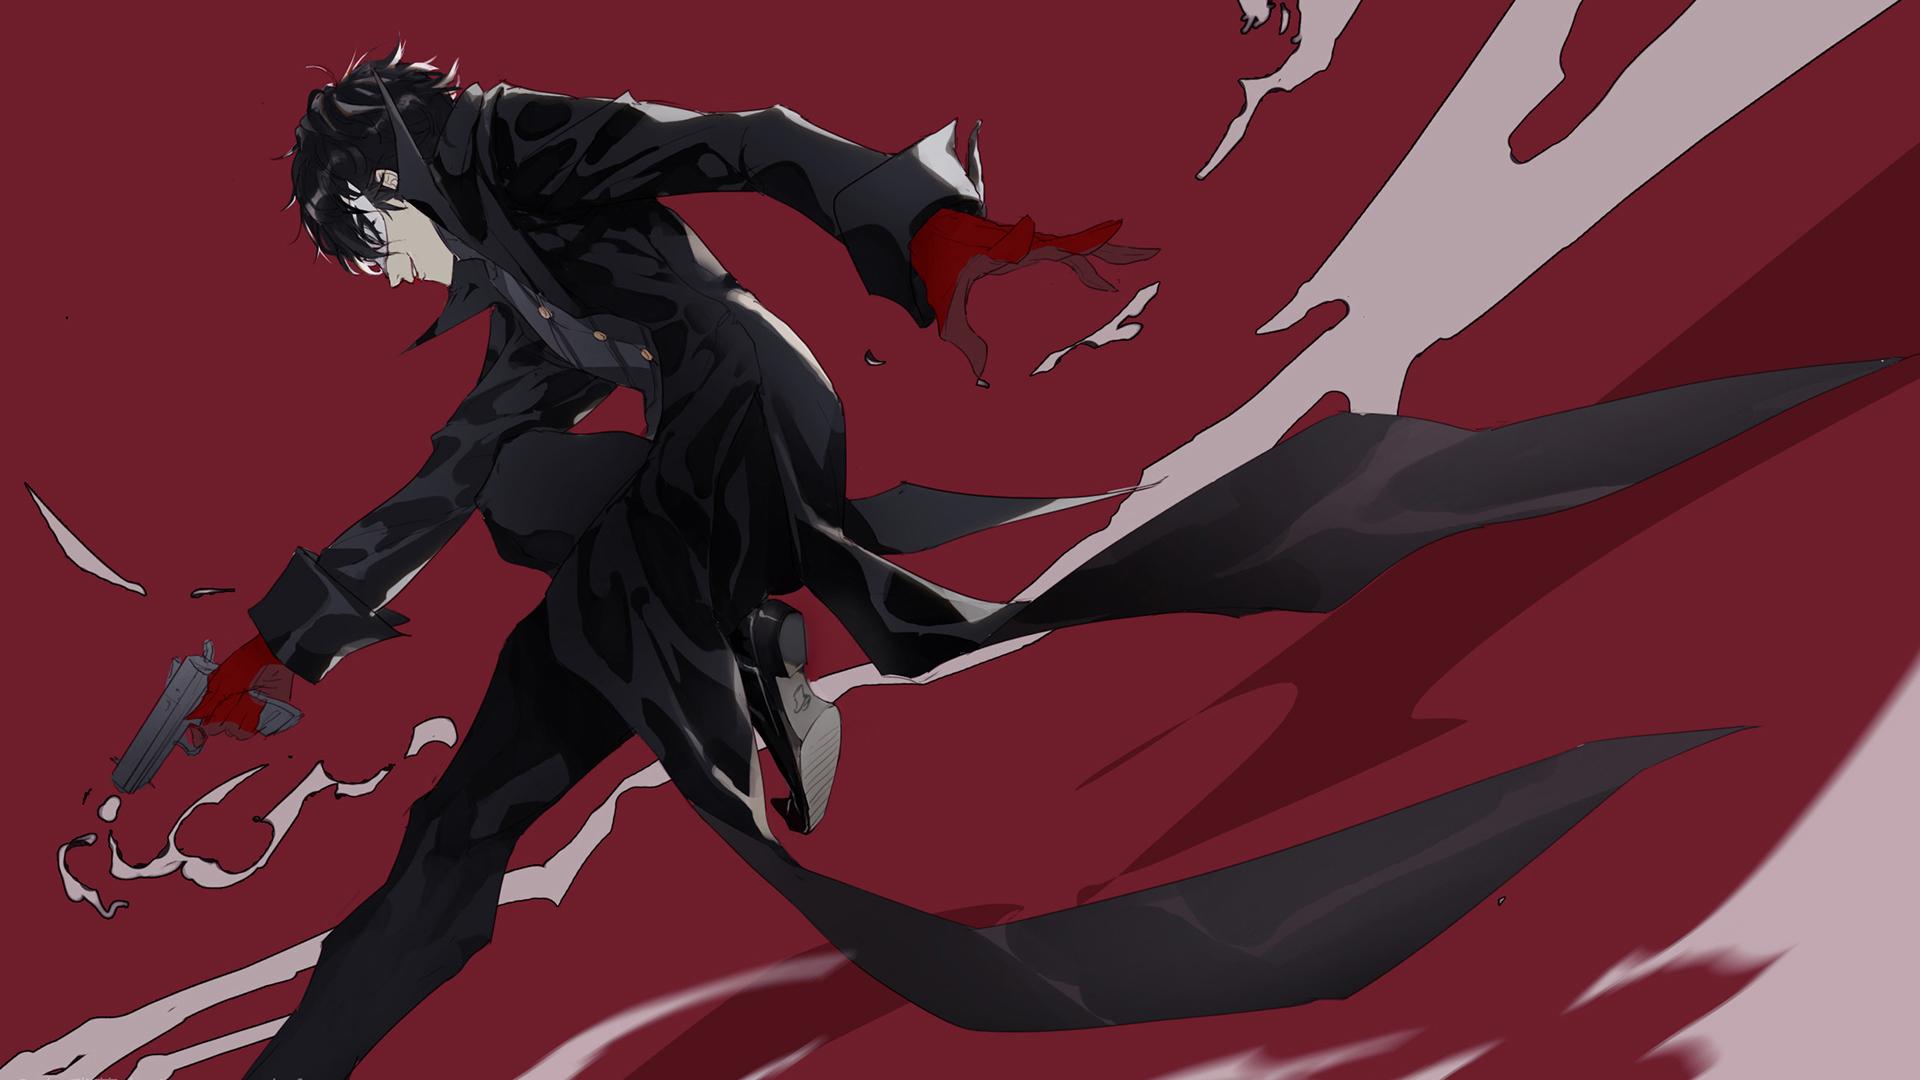 Persona 5 - Joker HD Wallpaper   Background Image ...